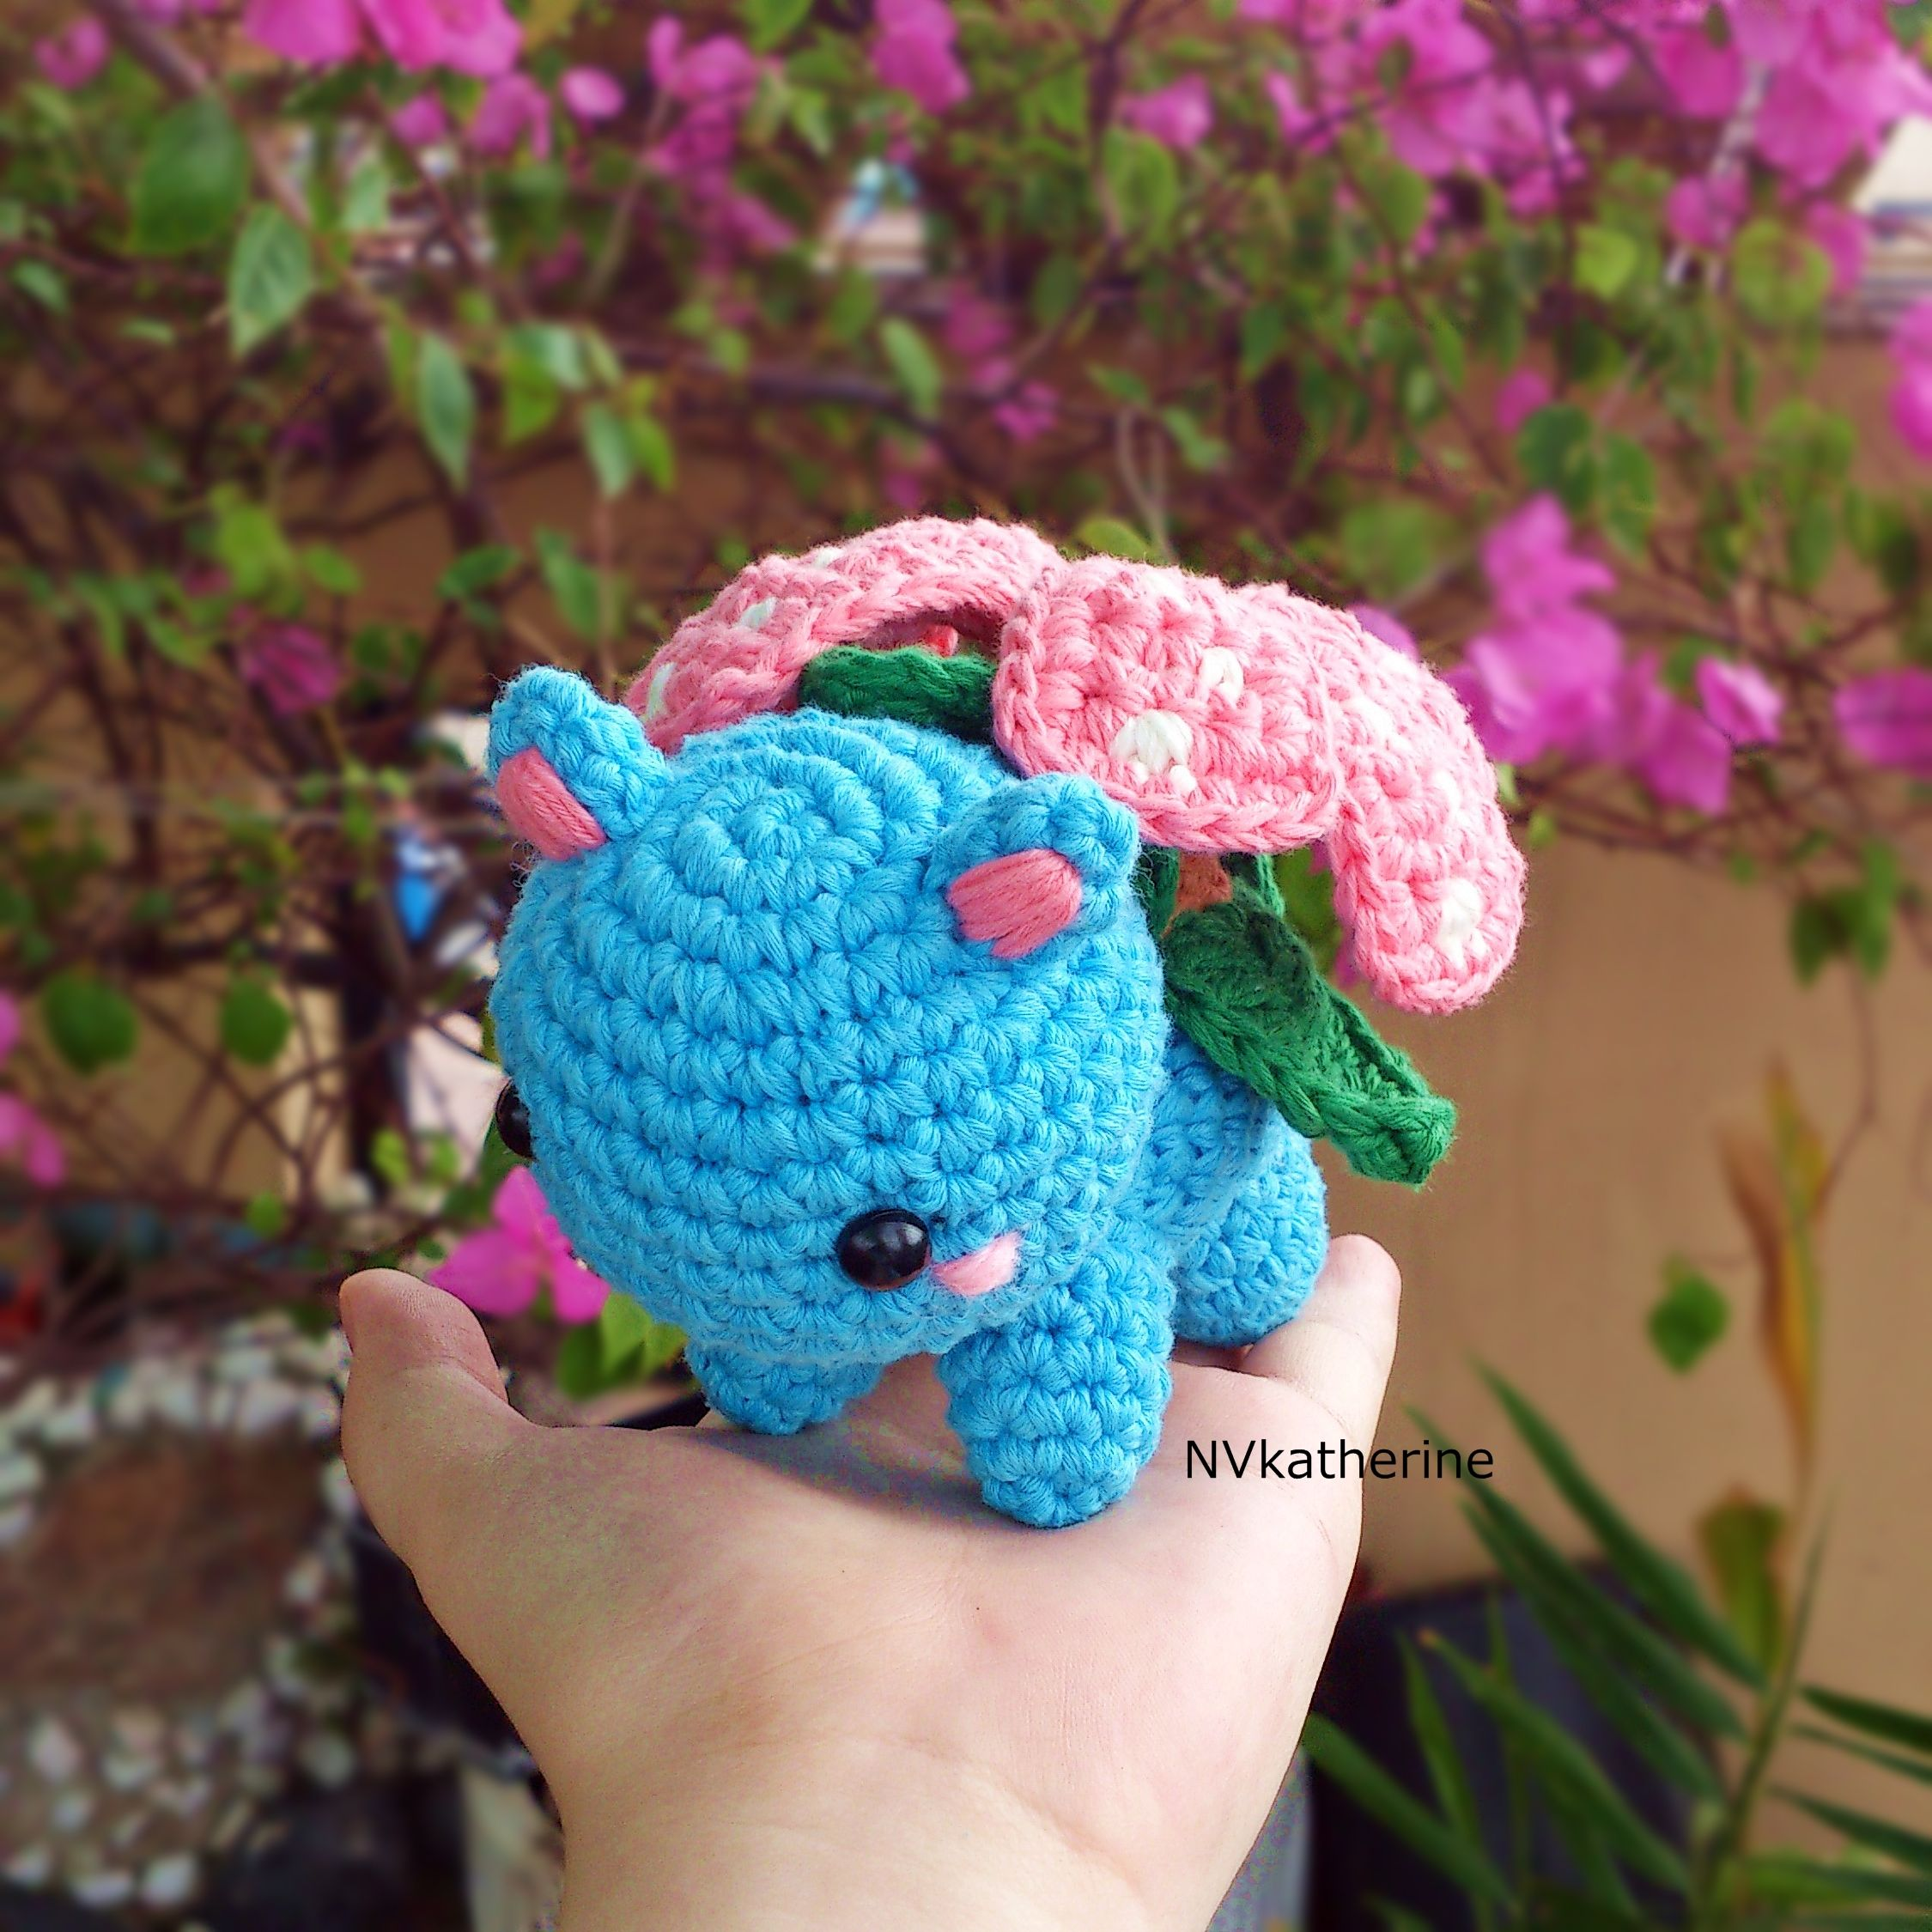 Pin By Erika Bishop On Crafts Crochet Crochet Pokemon Pokemon